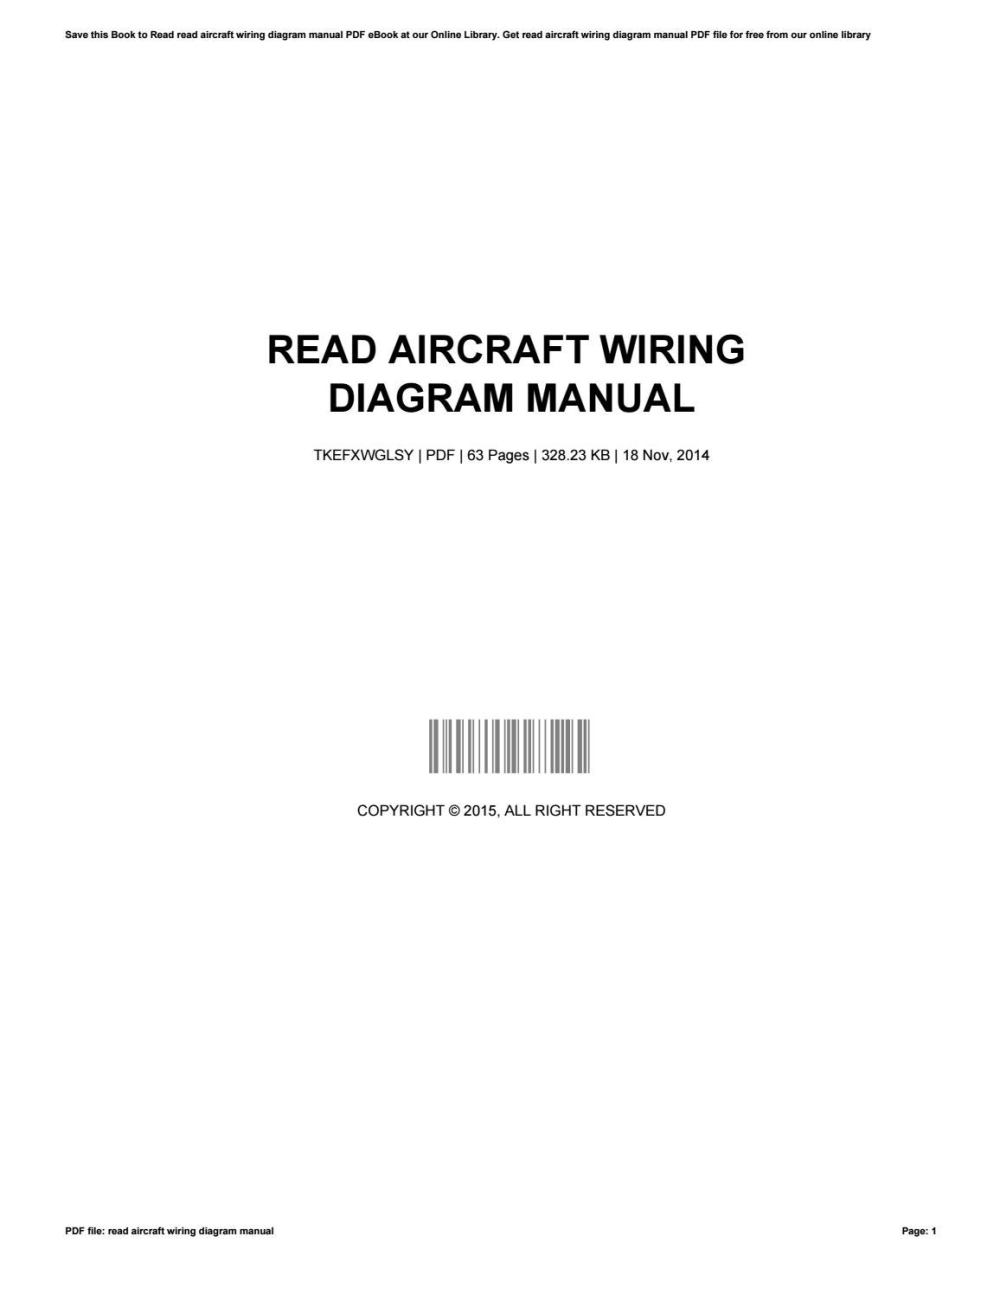 medium resolution of aircraft wiring diagram manual